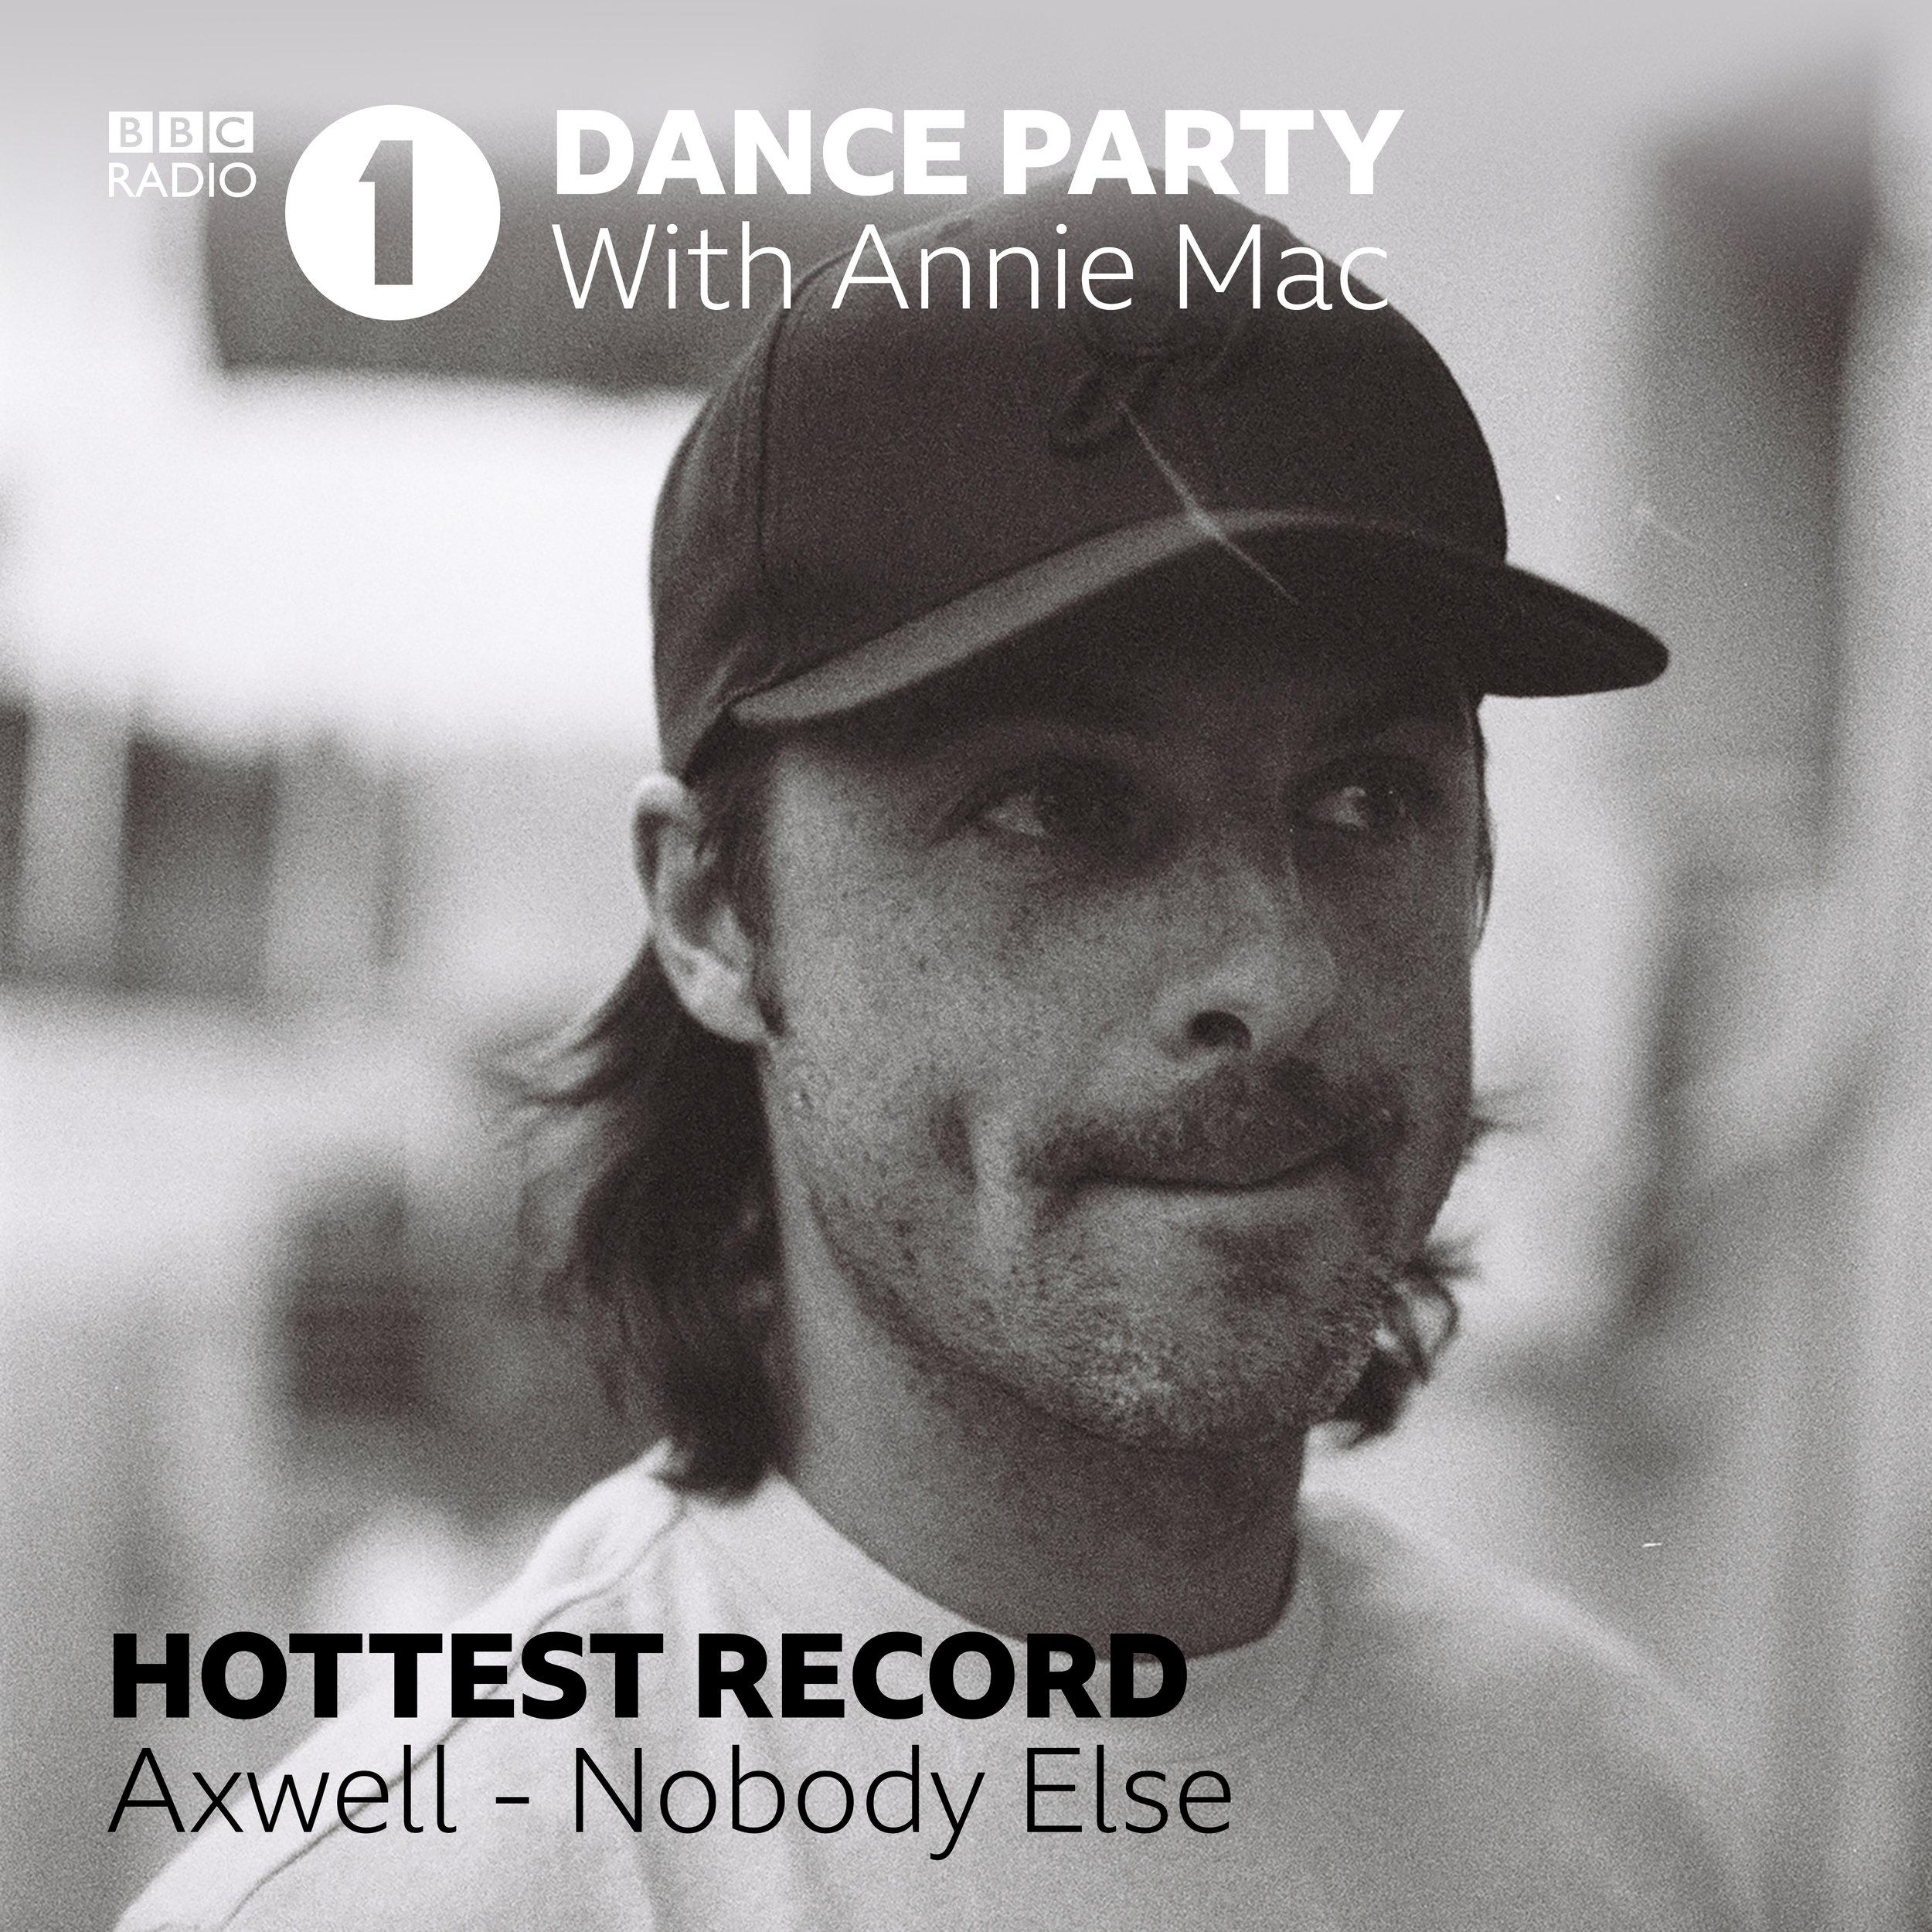 Annie Mac Hottest Record Flyer Axewll.jpg